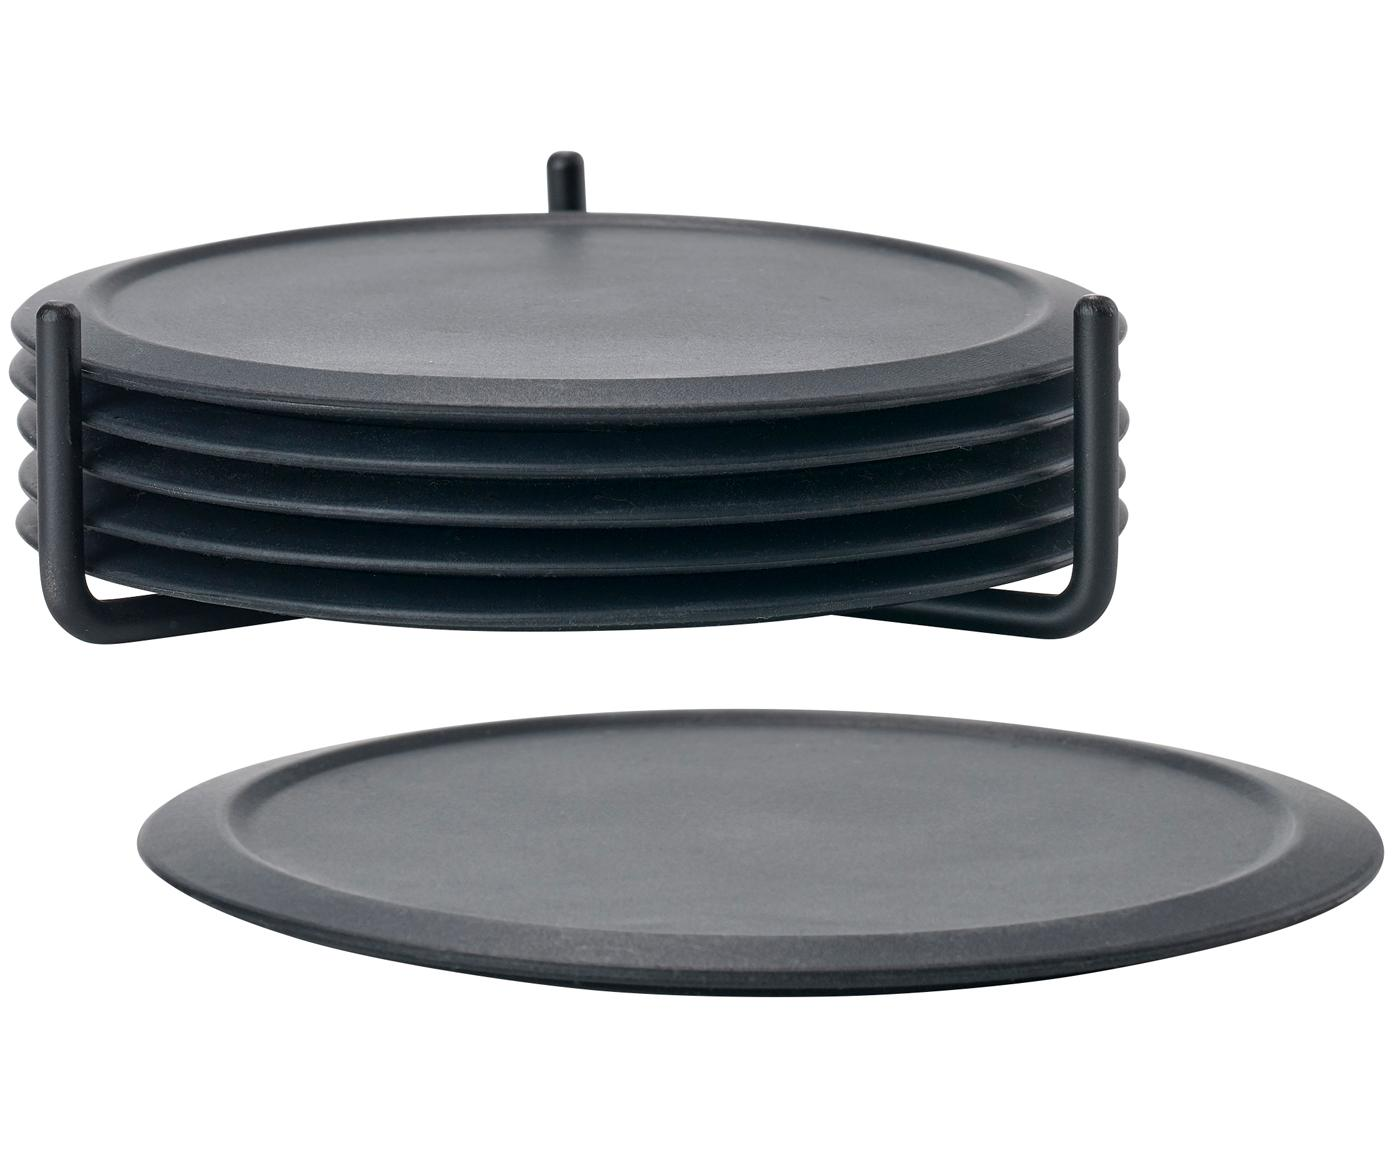 Komplet podstawek z silikonu Plain, 7 elem., Czarny, Ø 10 cm